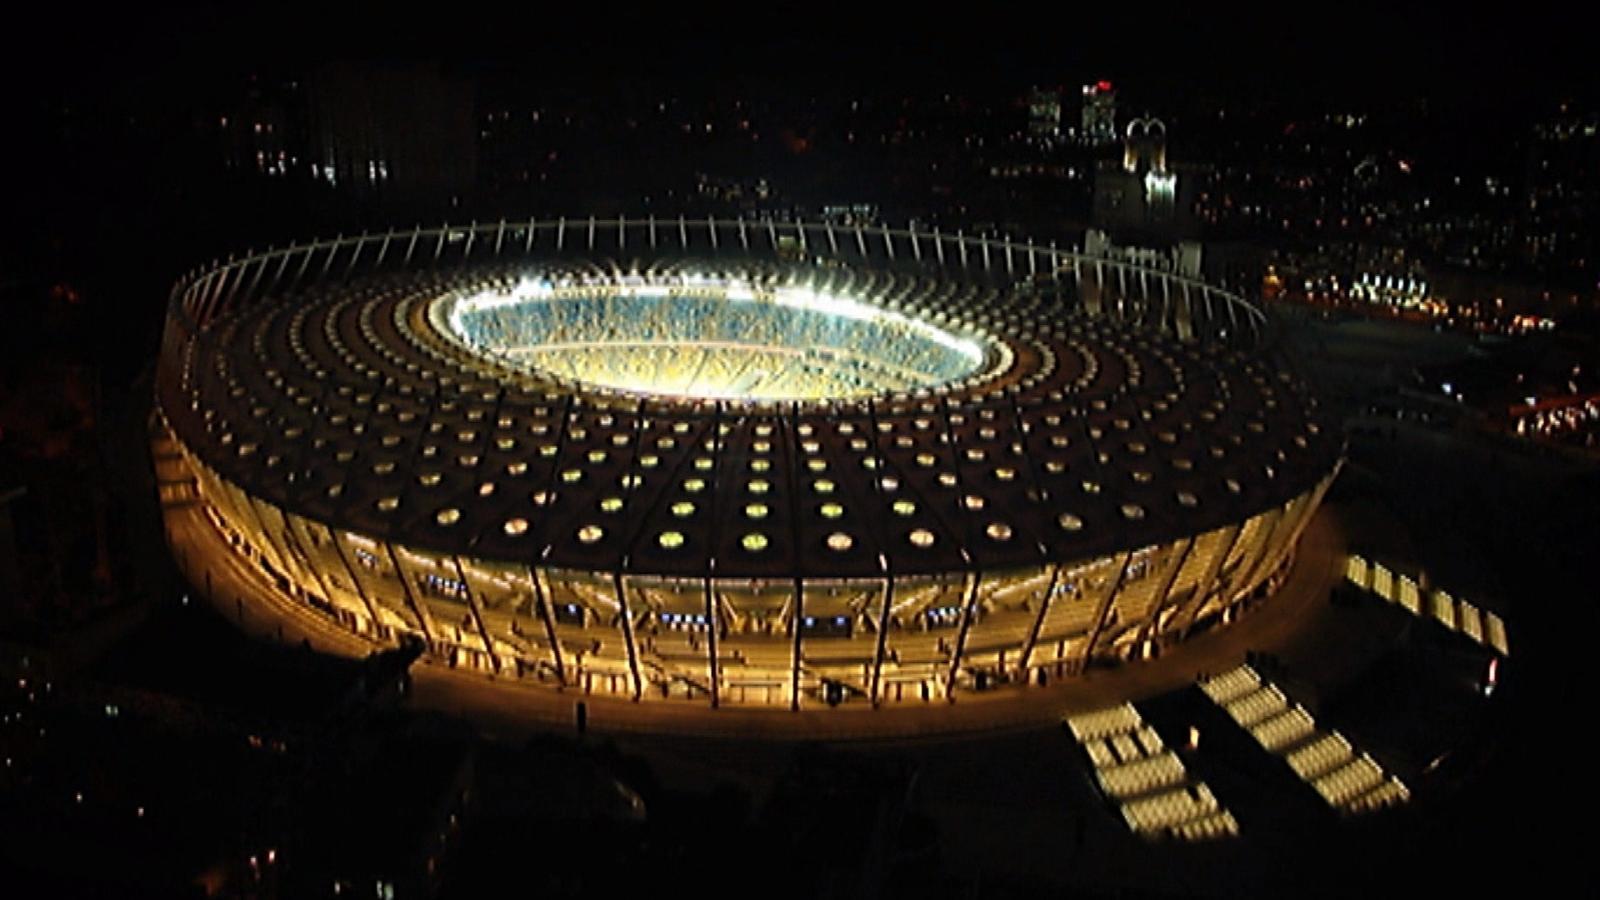 VIDEO - Kiev to host Champions League Final in 2018 - Champions League - Video Eurosport